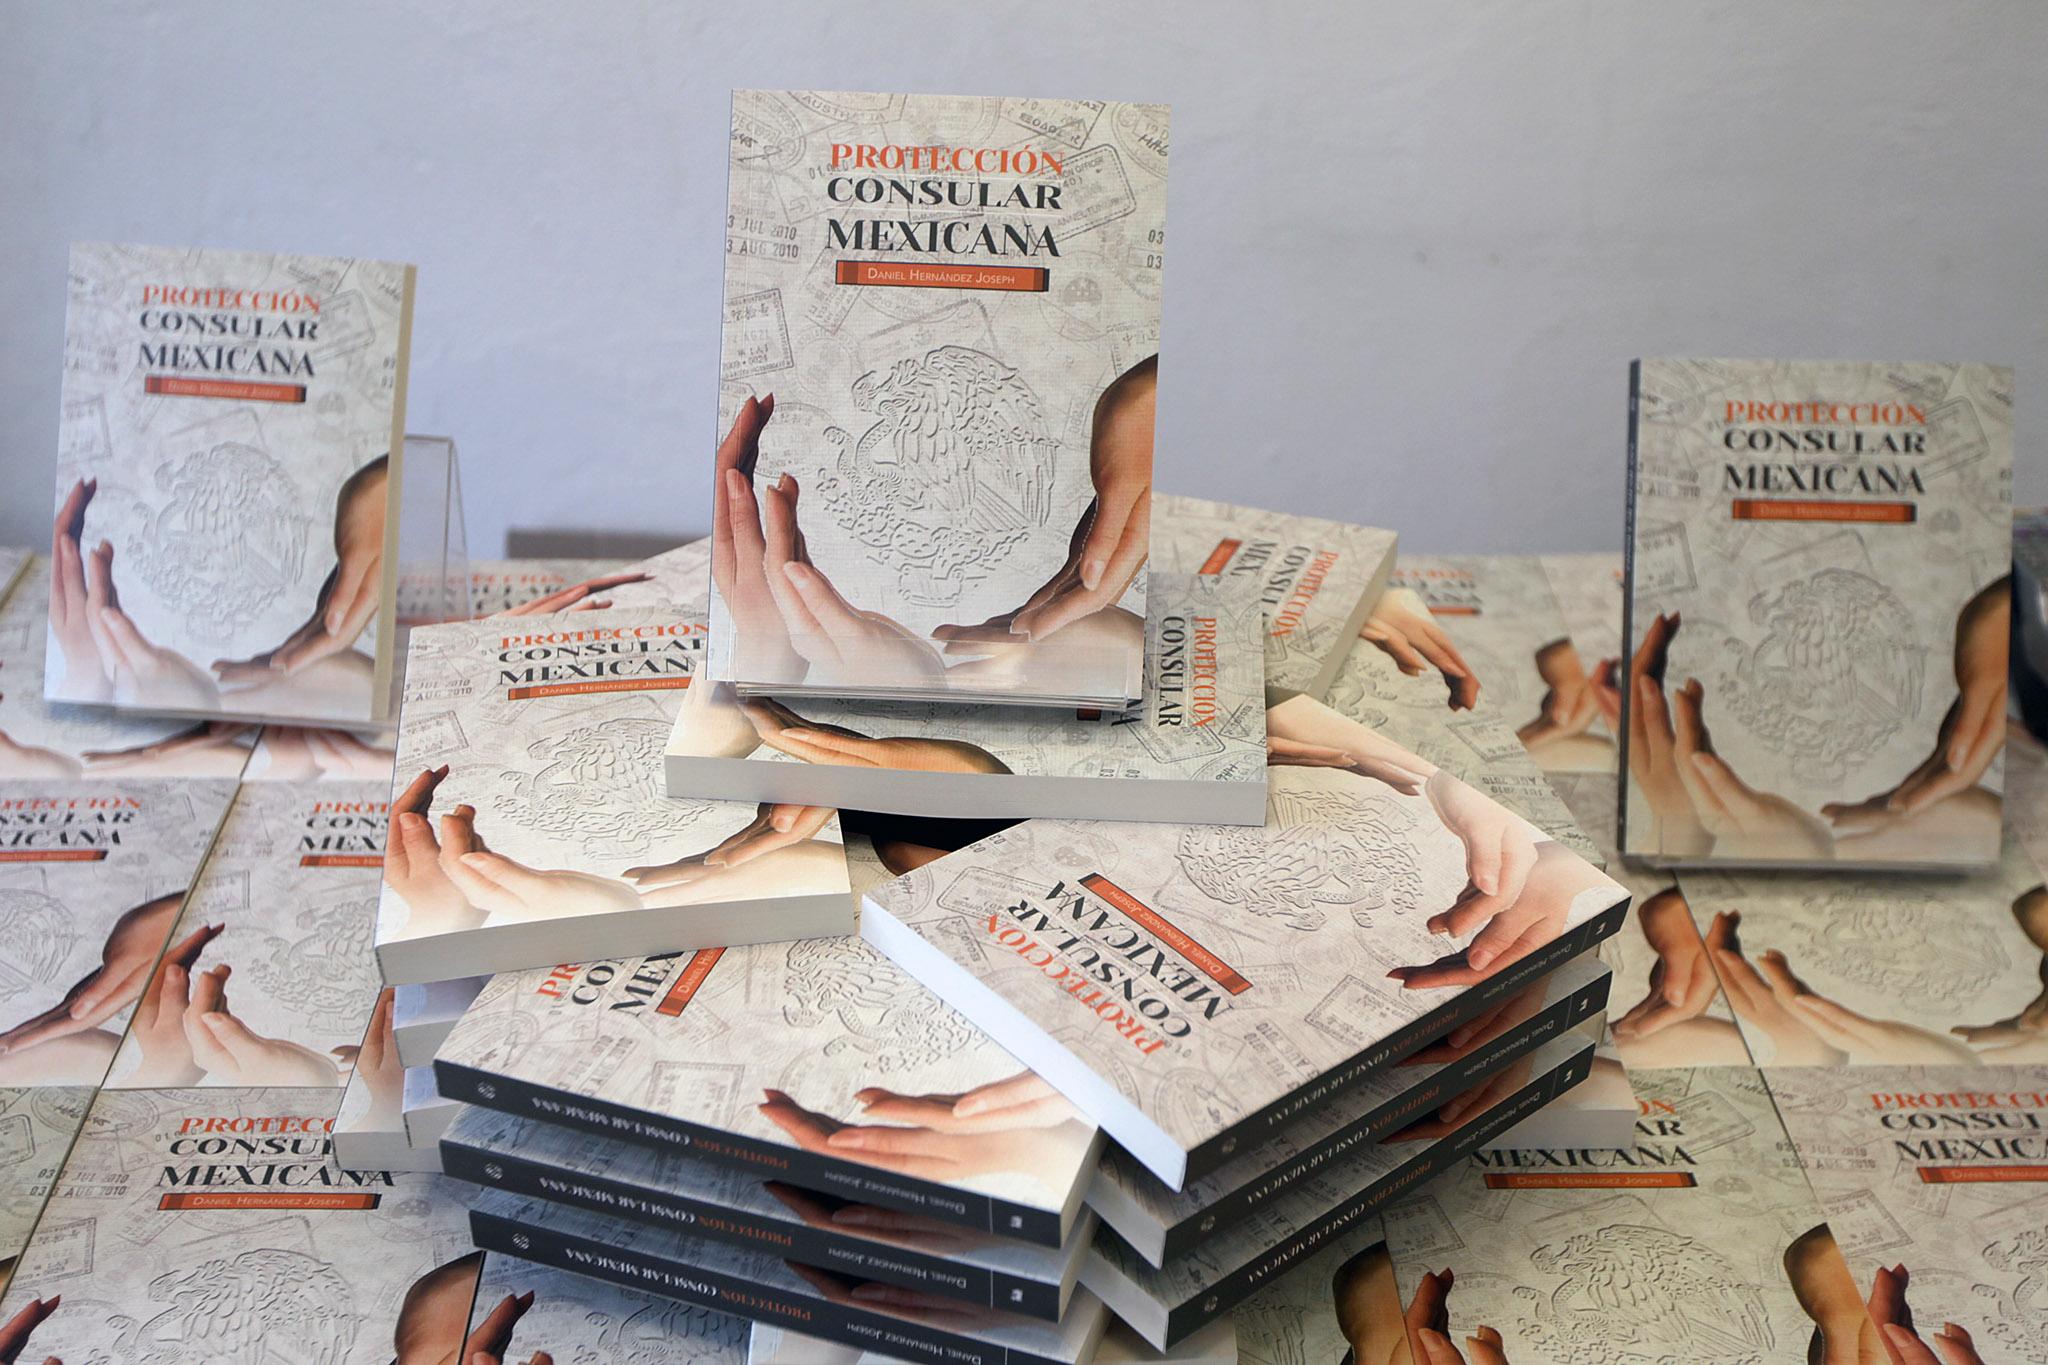 FOTO 2 Libro  Protecci n consular mexicana   del Embajador Daniel Hern ndez Joseph.jpg